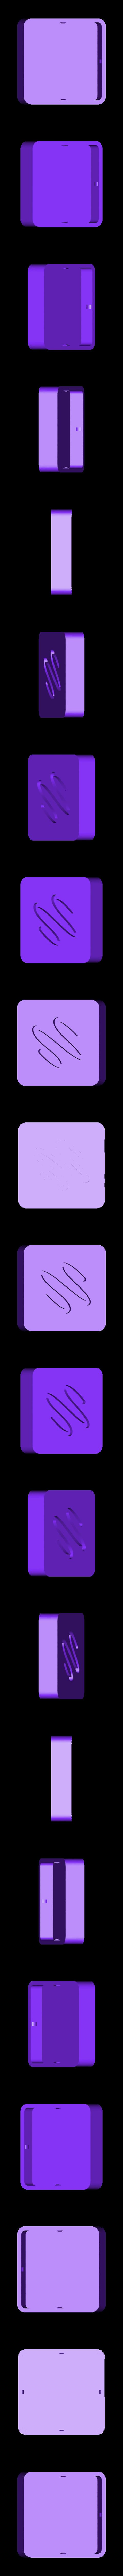 cover_snake.stl Télécharger fichier STL gratuit small boxes with coloured insert • Plan pour impression 3D, cyrus